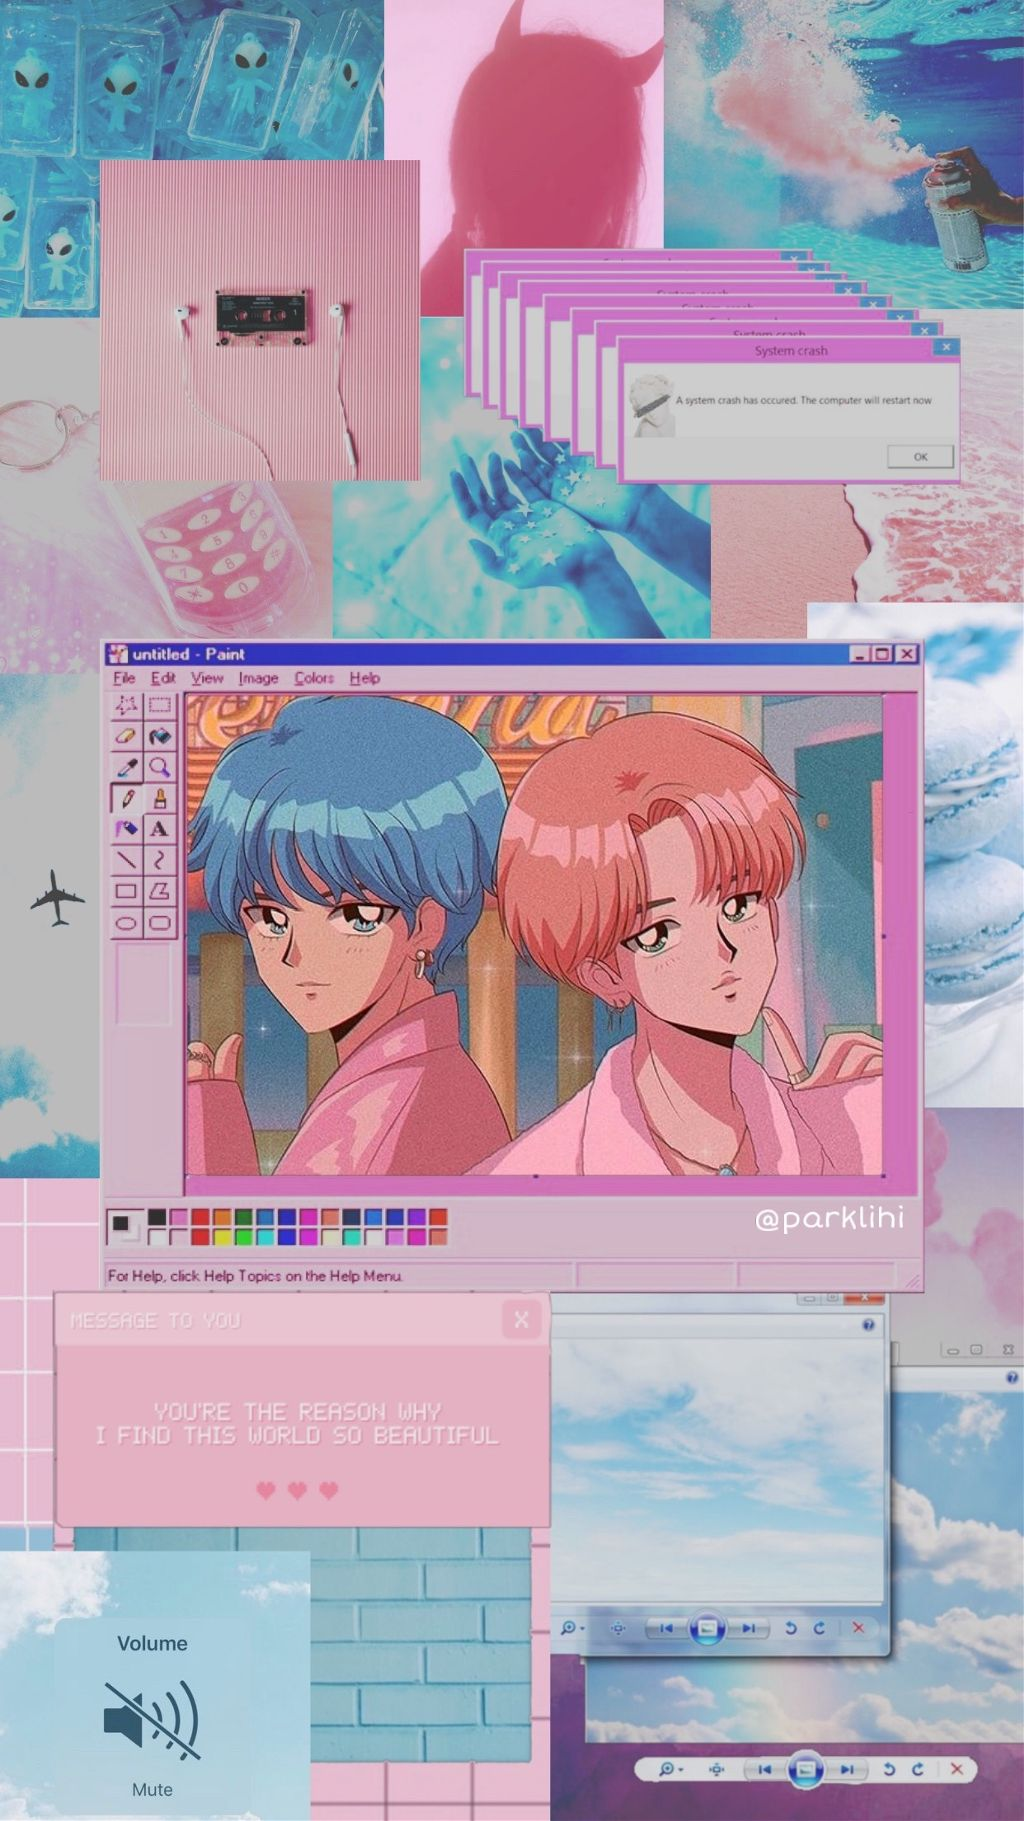 Anime Pink Aesthetic Wallpaper Desktop